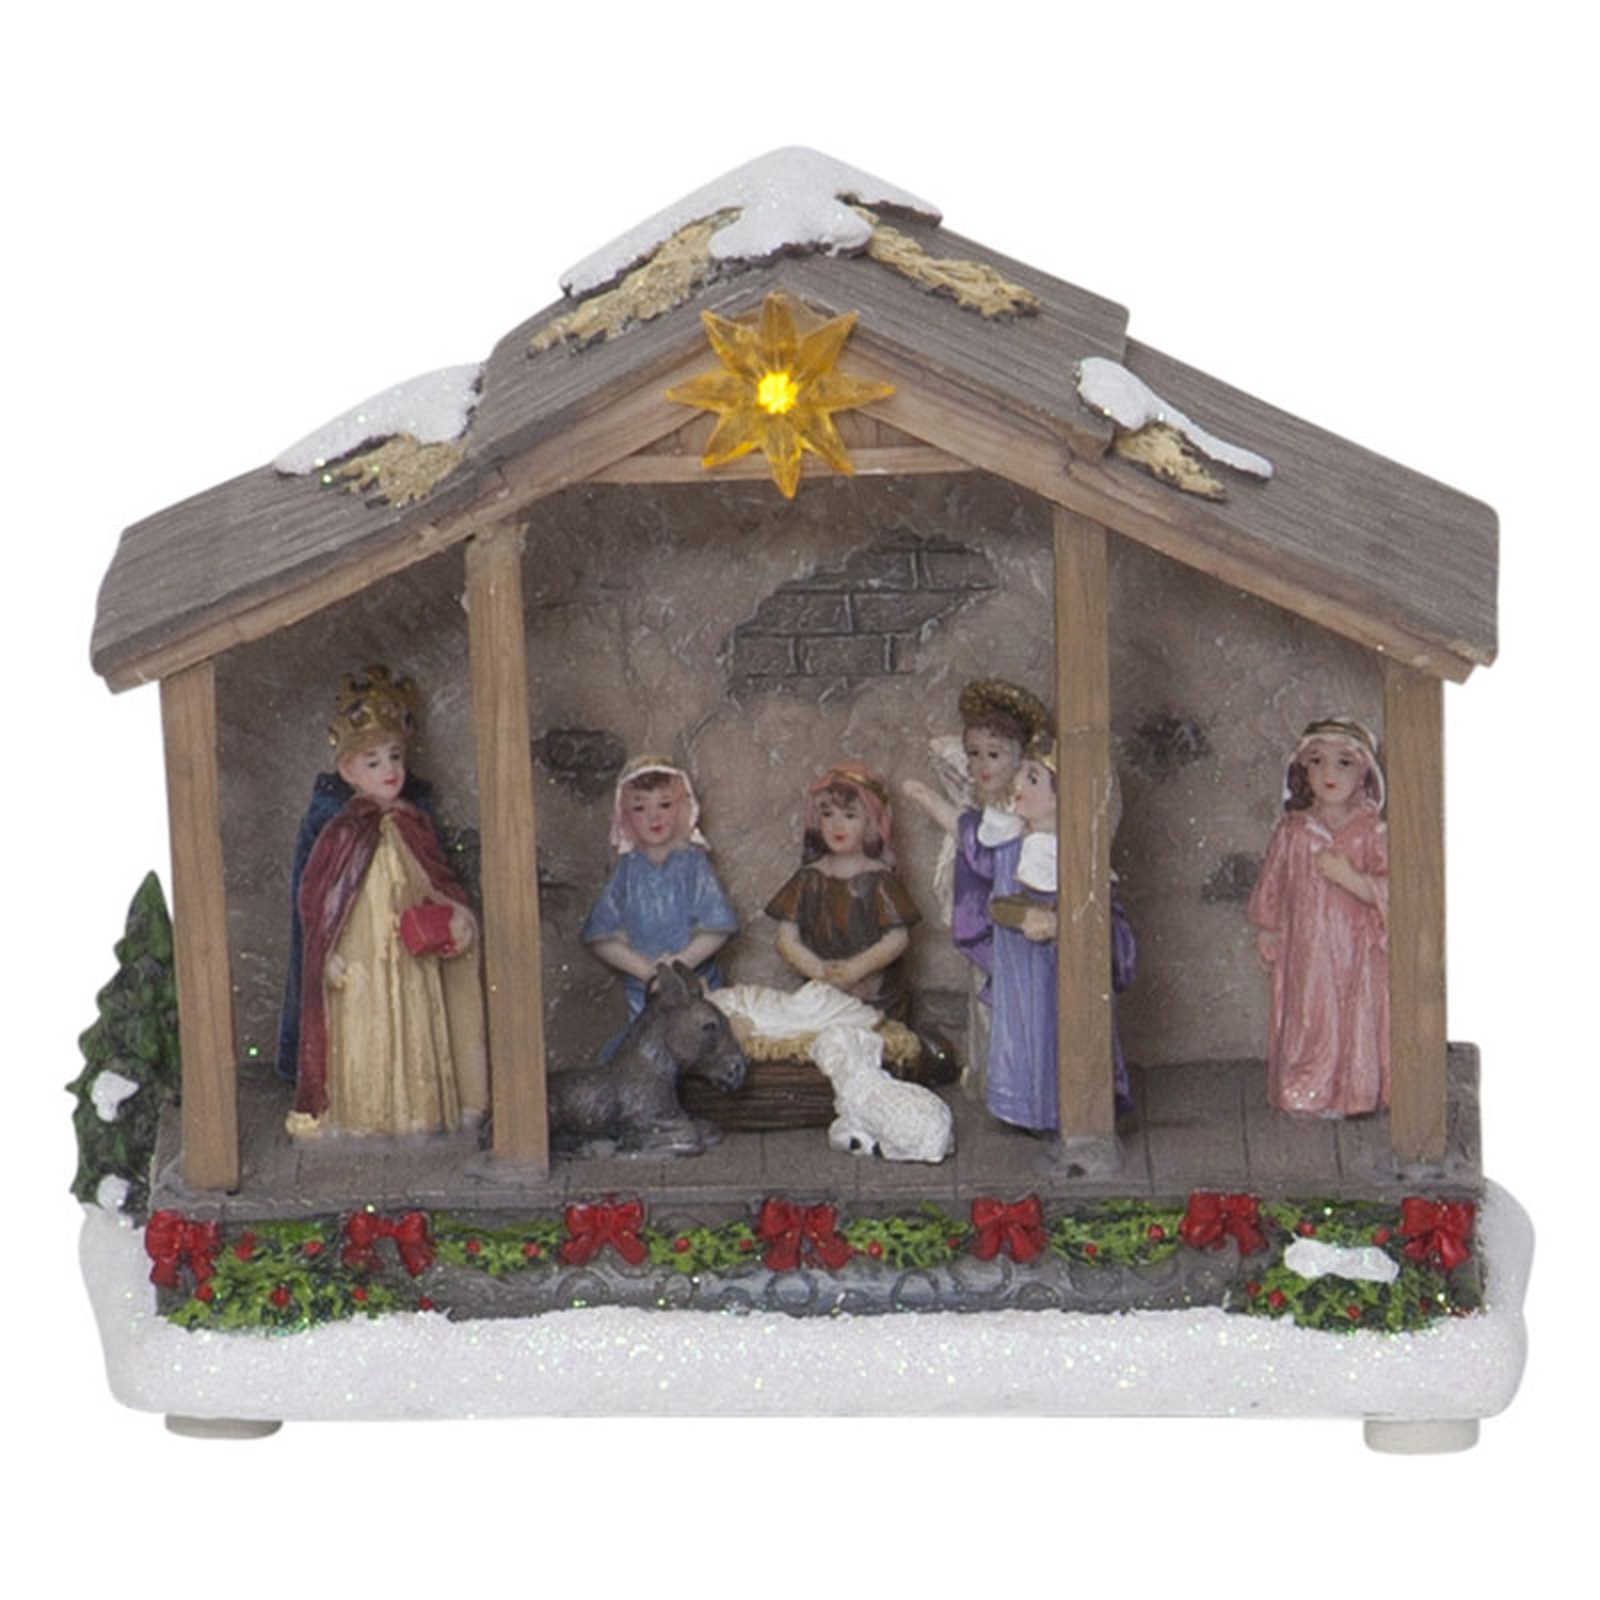 LED-Dekoleuchte Nativity, Batteriebetrieb, 19 cm